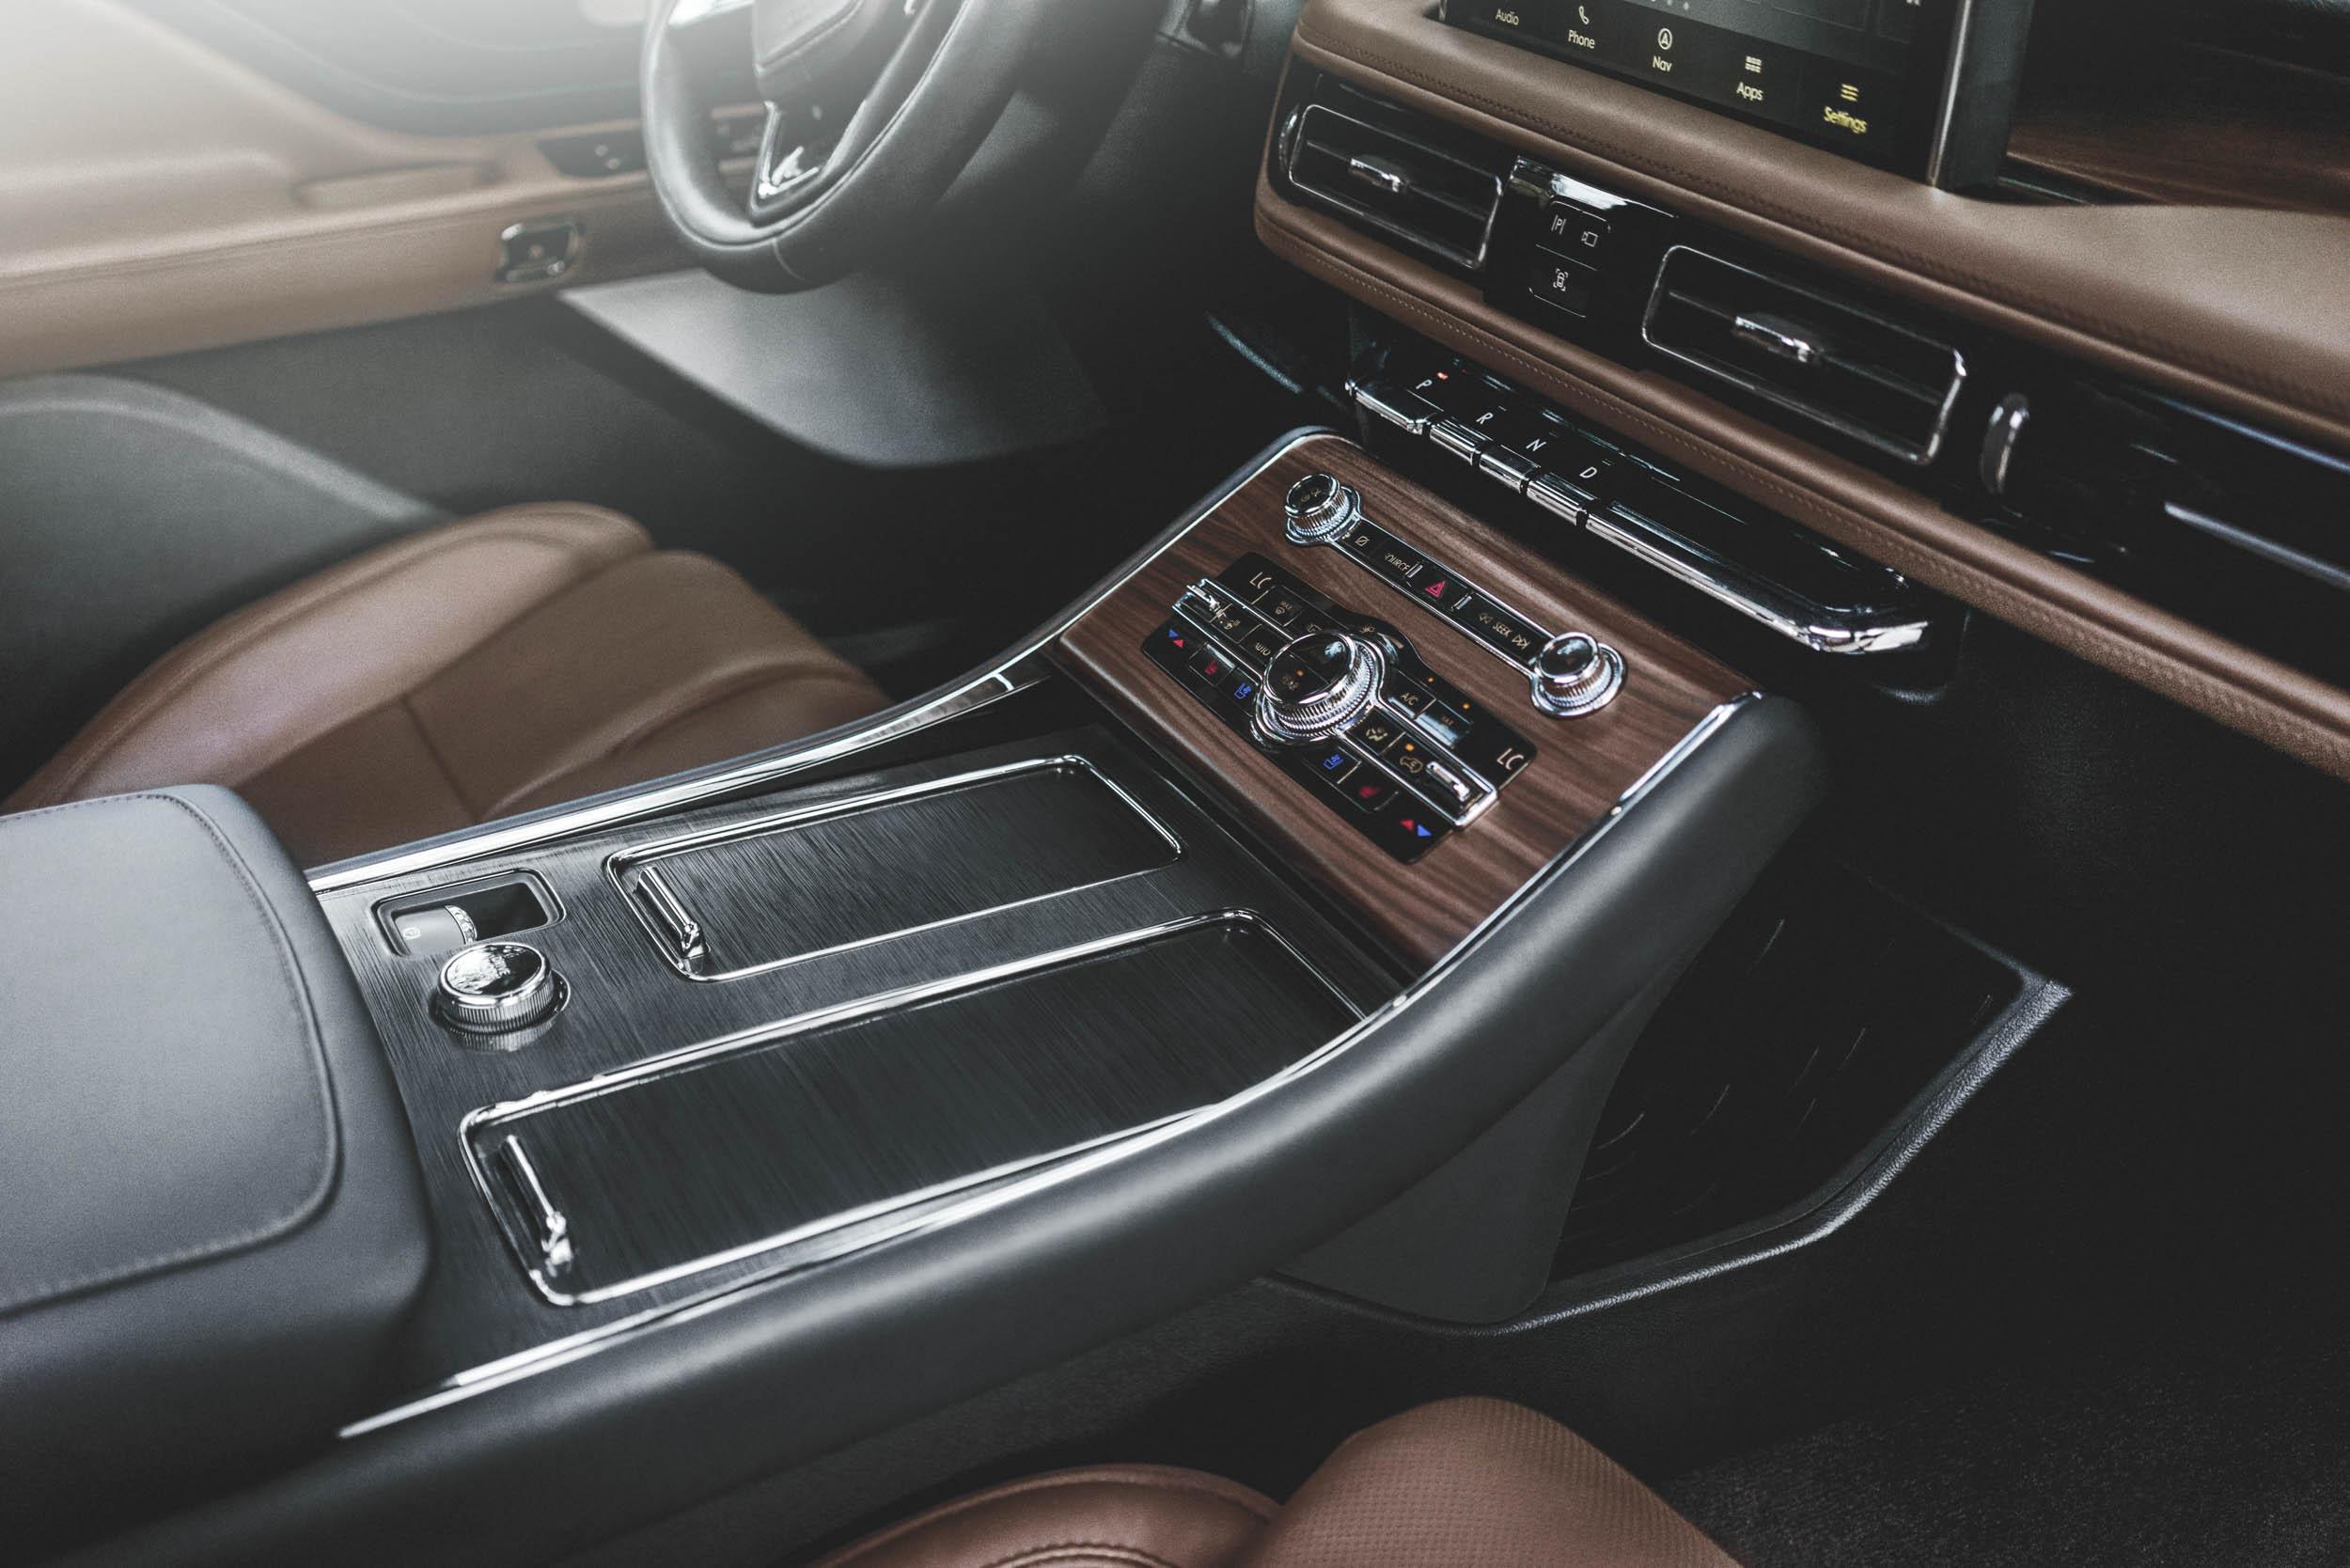 2020 Lincoln Aviator interior details